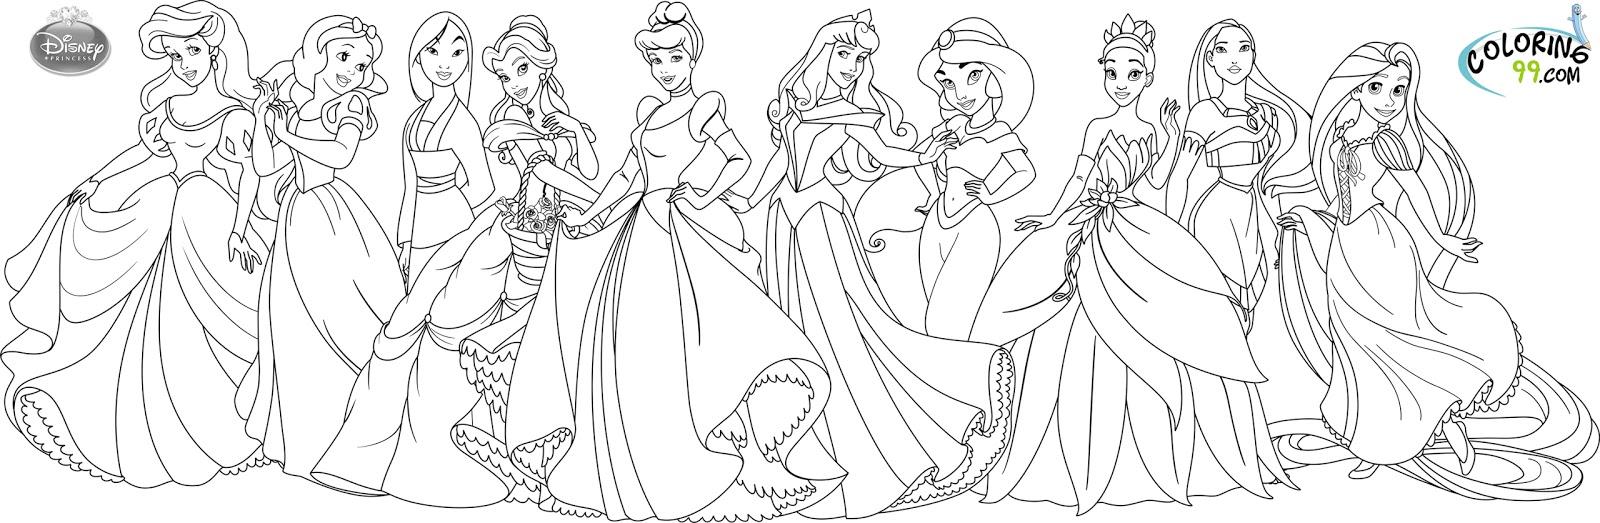 princess coloring pages photo - 1